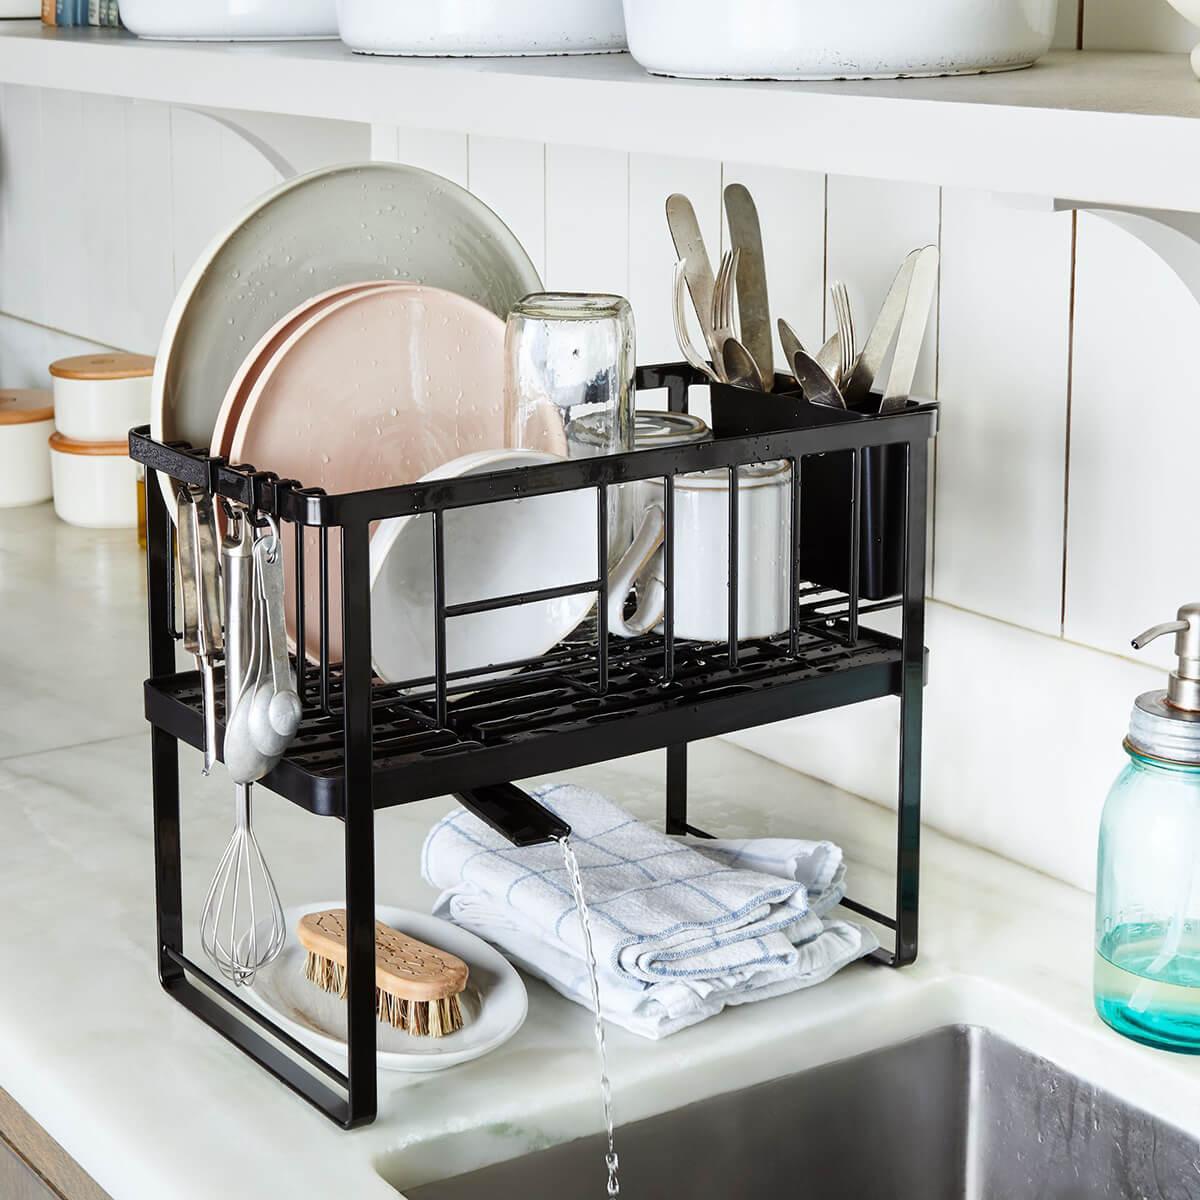 Sleek Modern Black Counter Sink Drying Rack